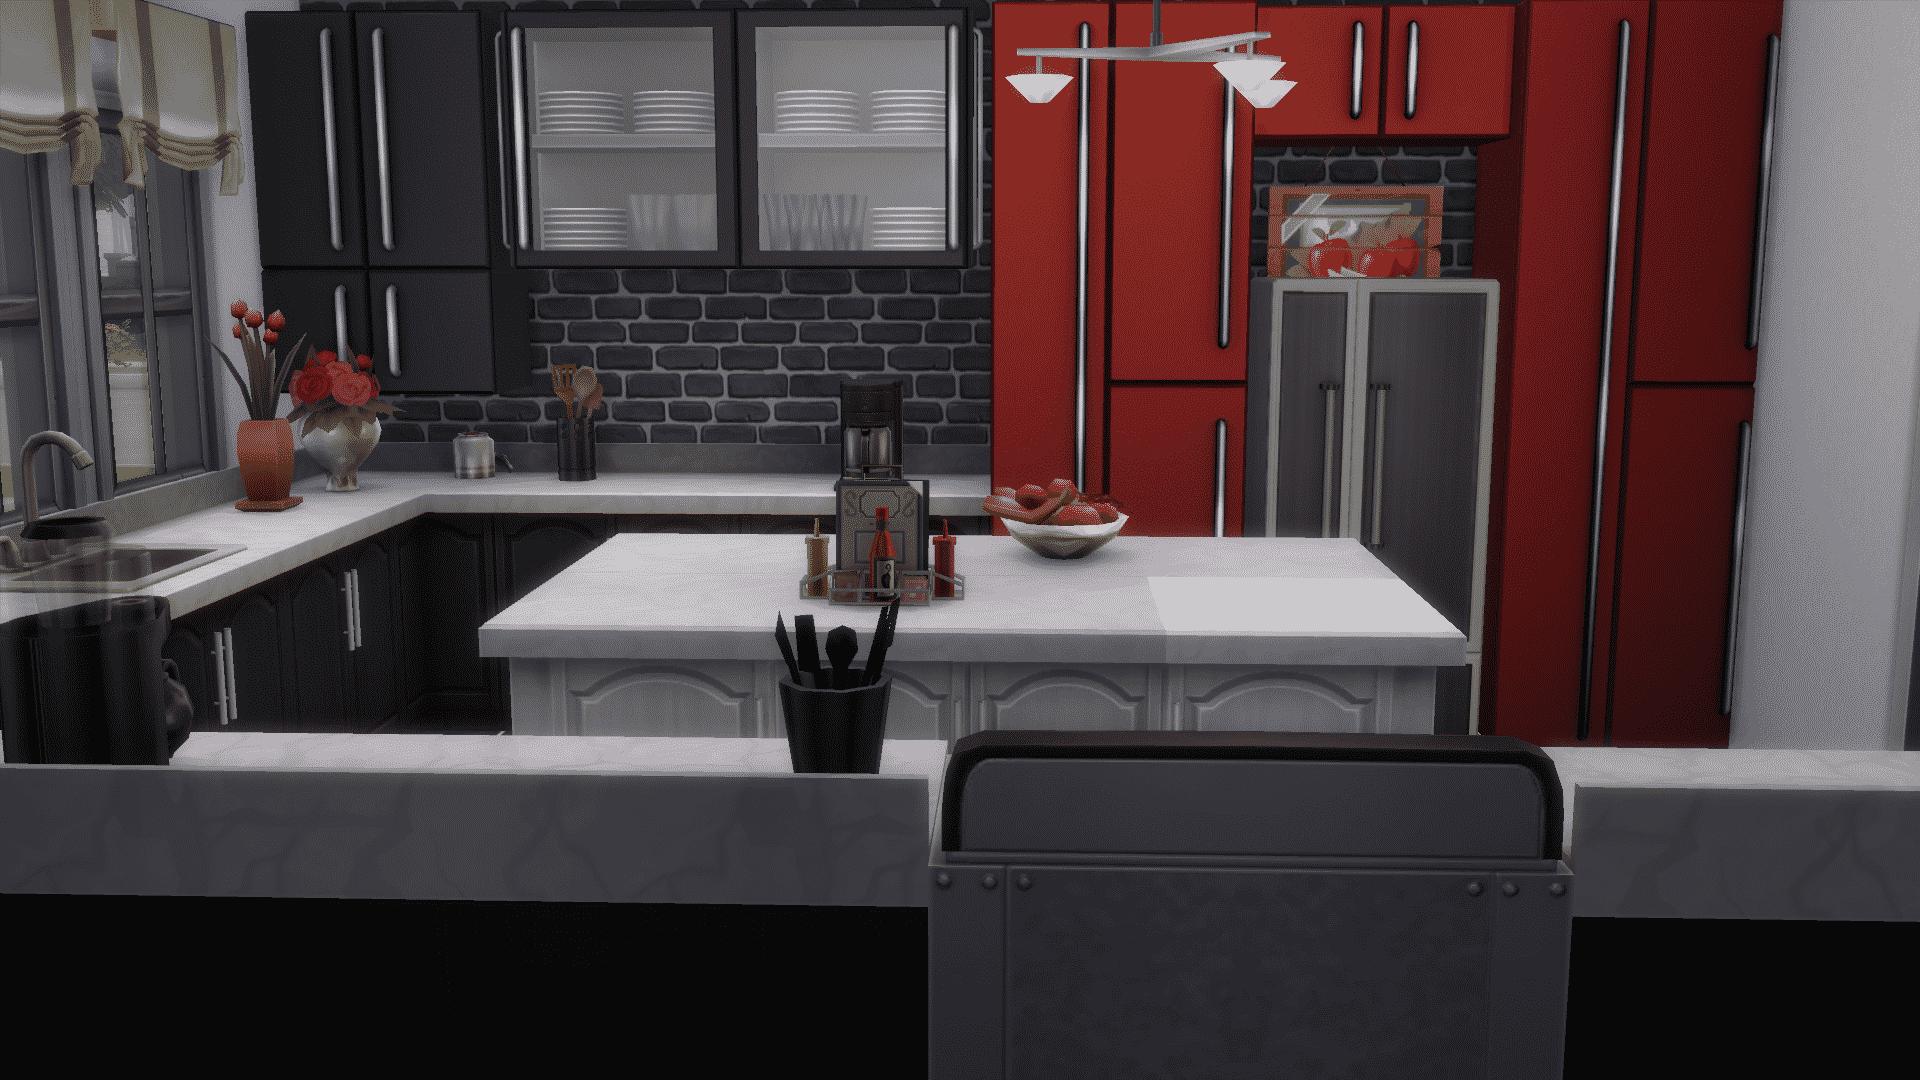 The Sims 4 Interior Design Guide